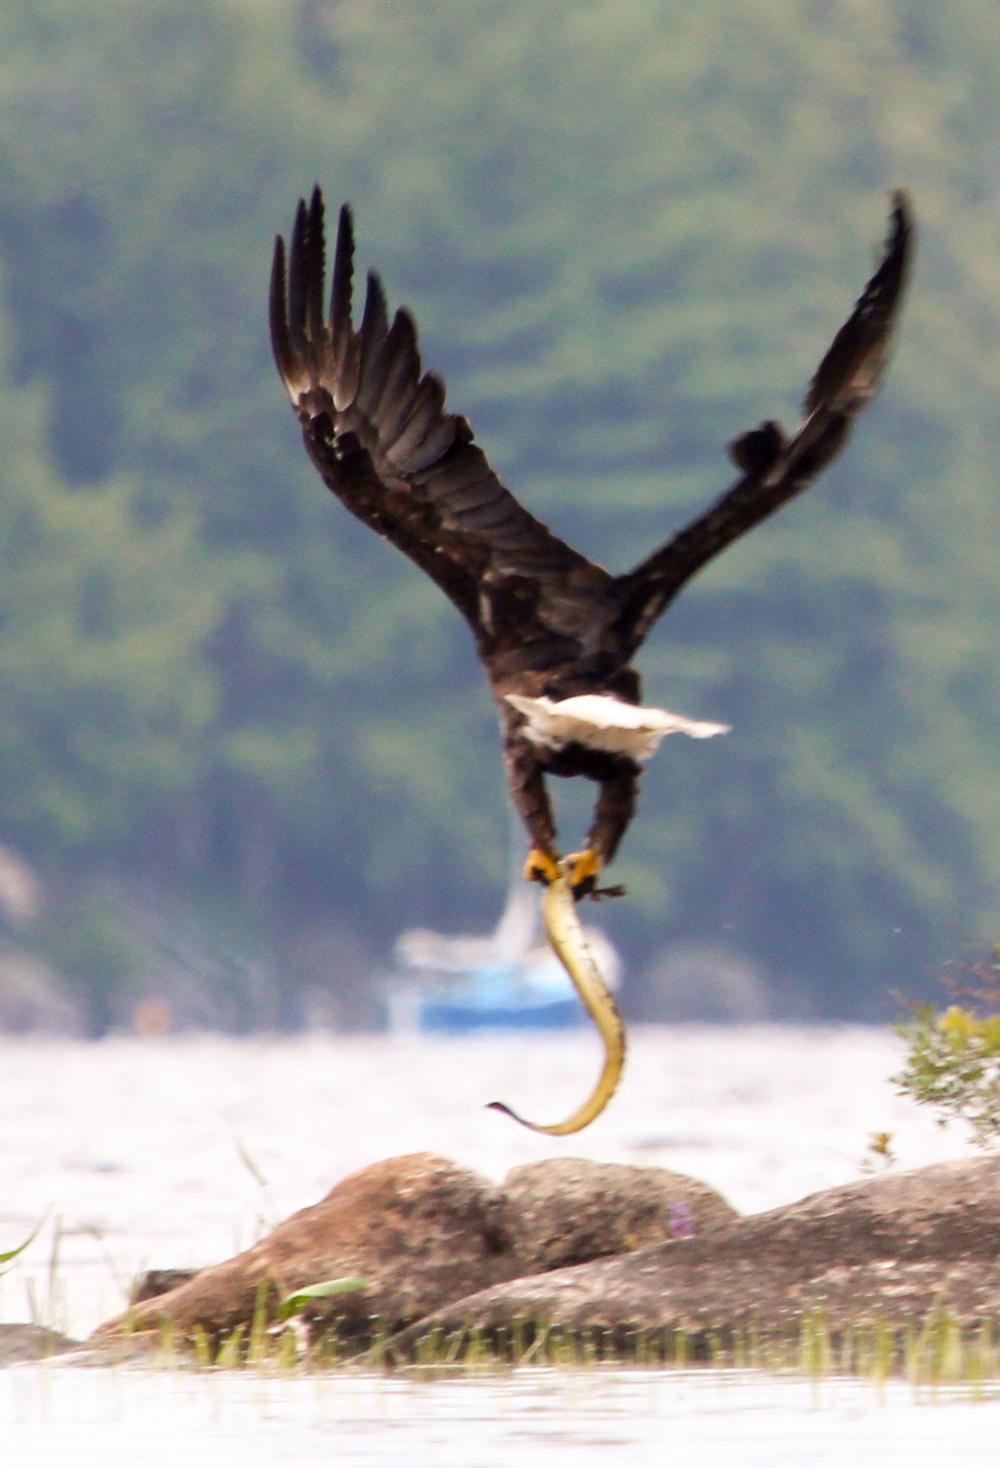 Bye-bye, Mr. Eagle!